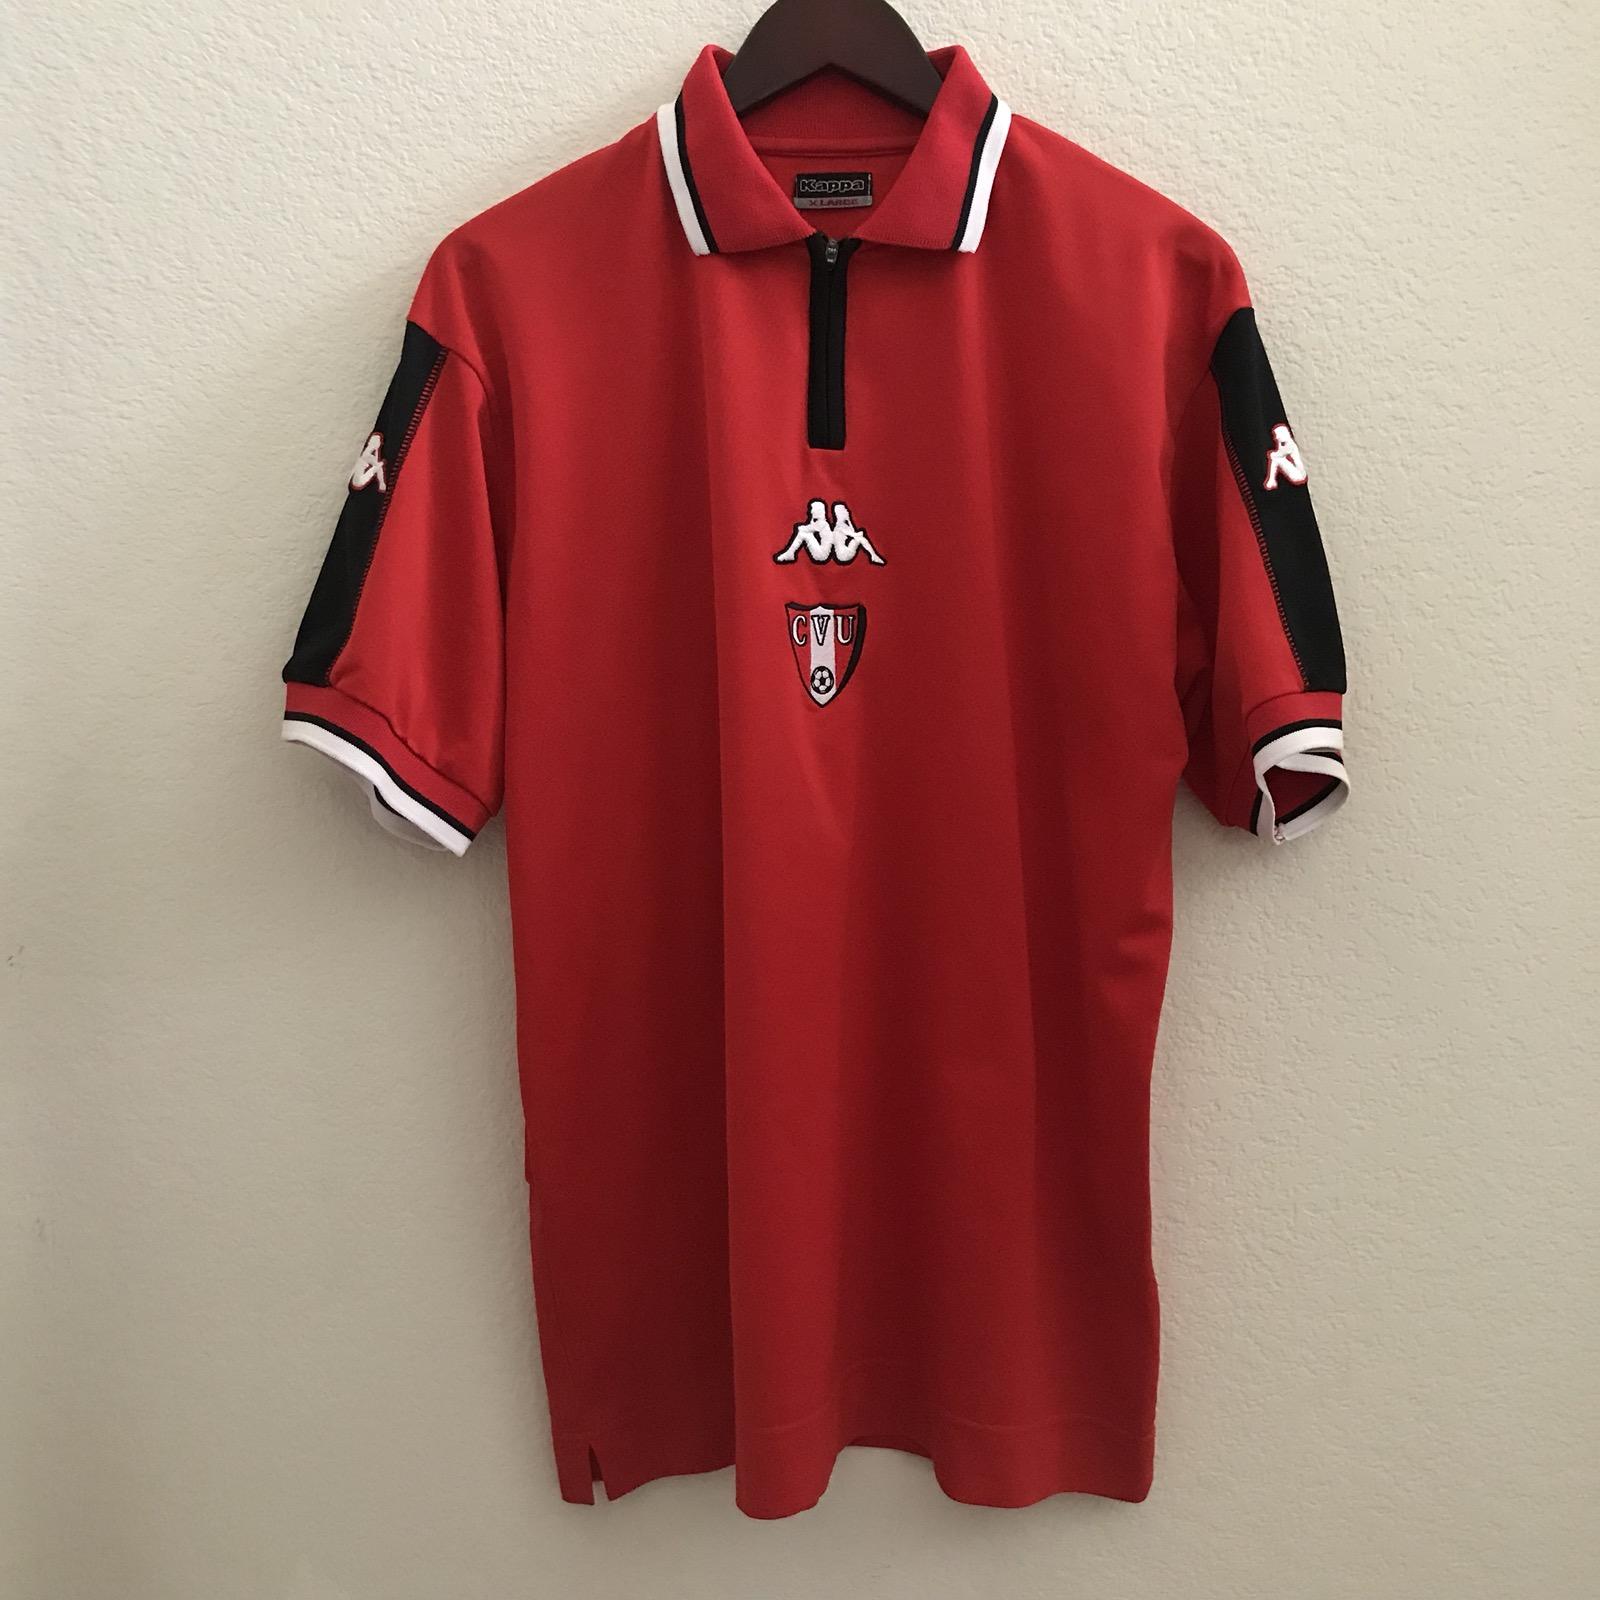 Vintage Vintage Kappa Red CVU 1 2 Zip Polo Shirt Size xl - Polos for Sale -  Grailed f9985c896